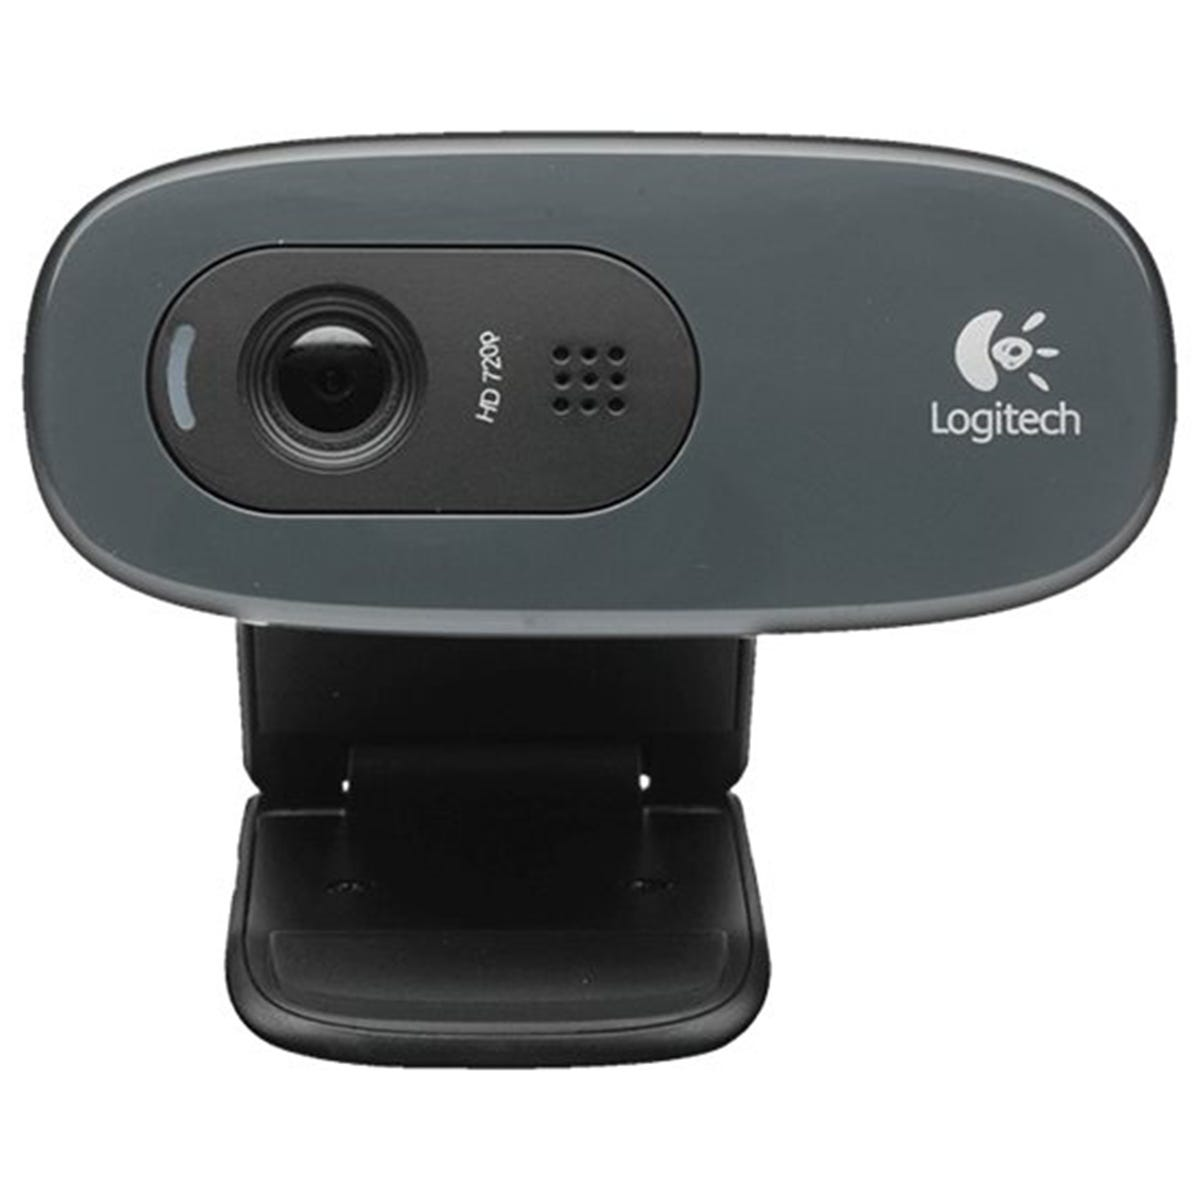 Logitech C270 HD 720p Plug & Play Webcam